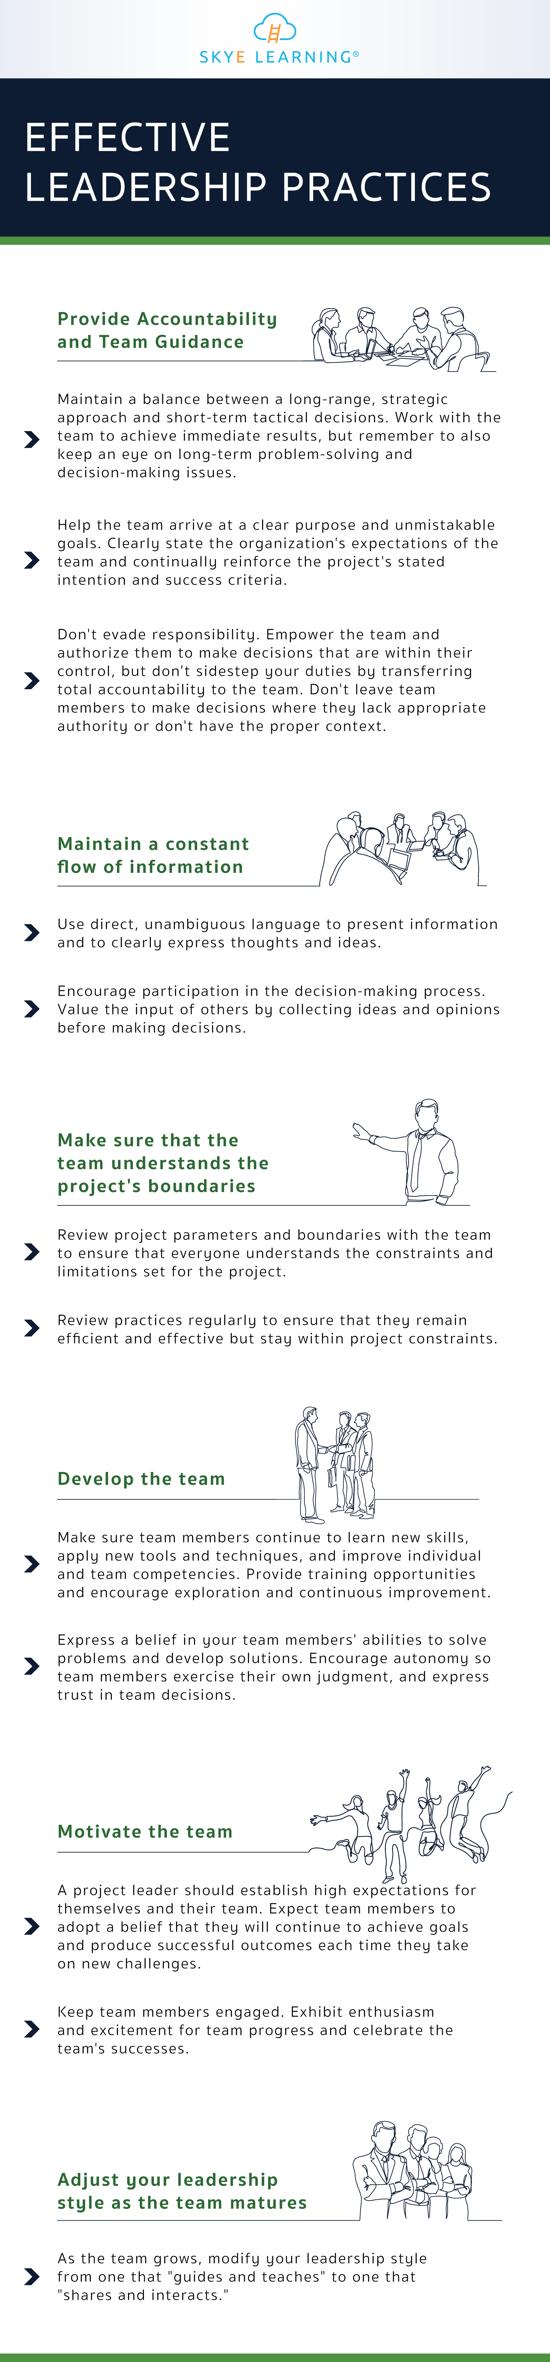 effective_leadership_practices_infographic_SL